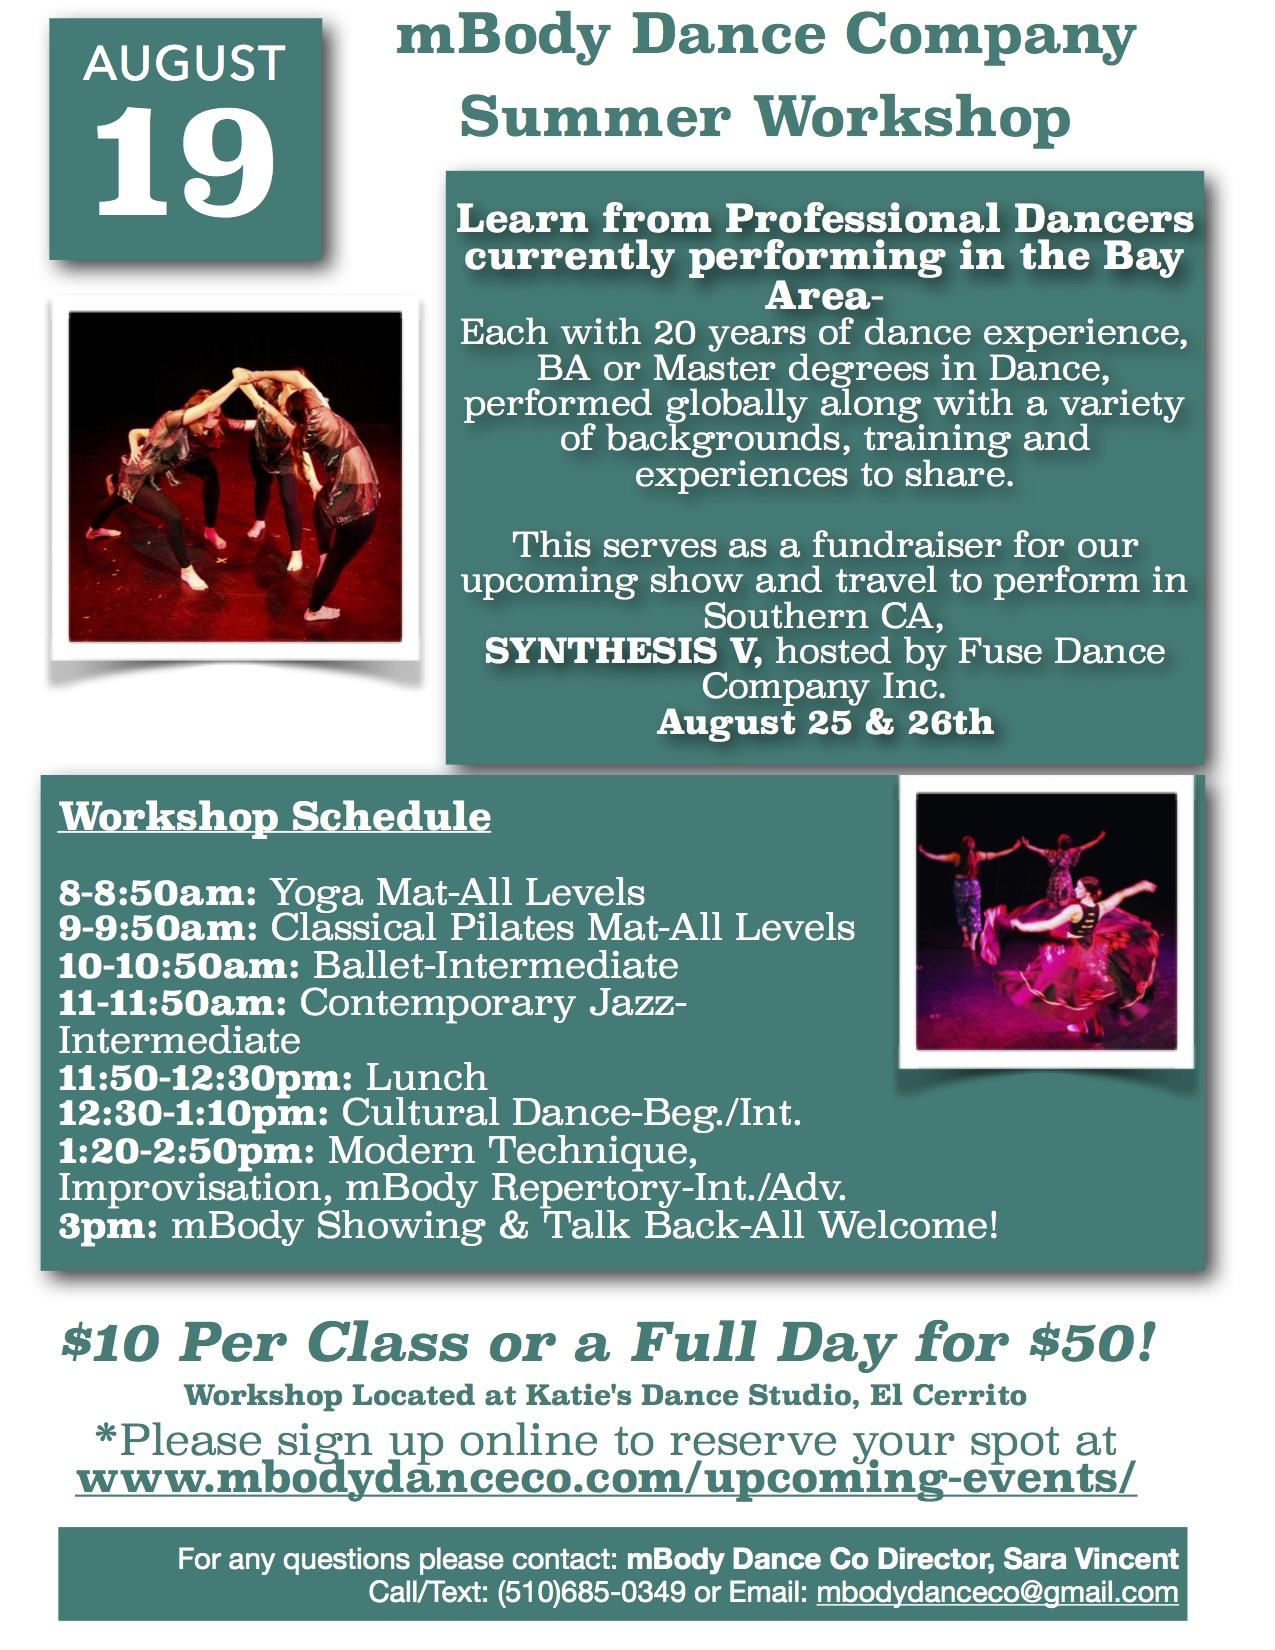 mBody Summer Workshop-Aug 19 (final)